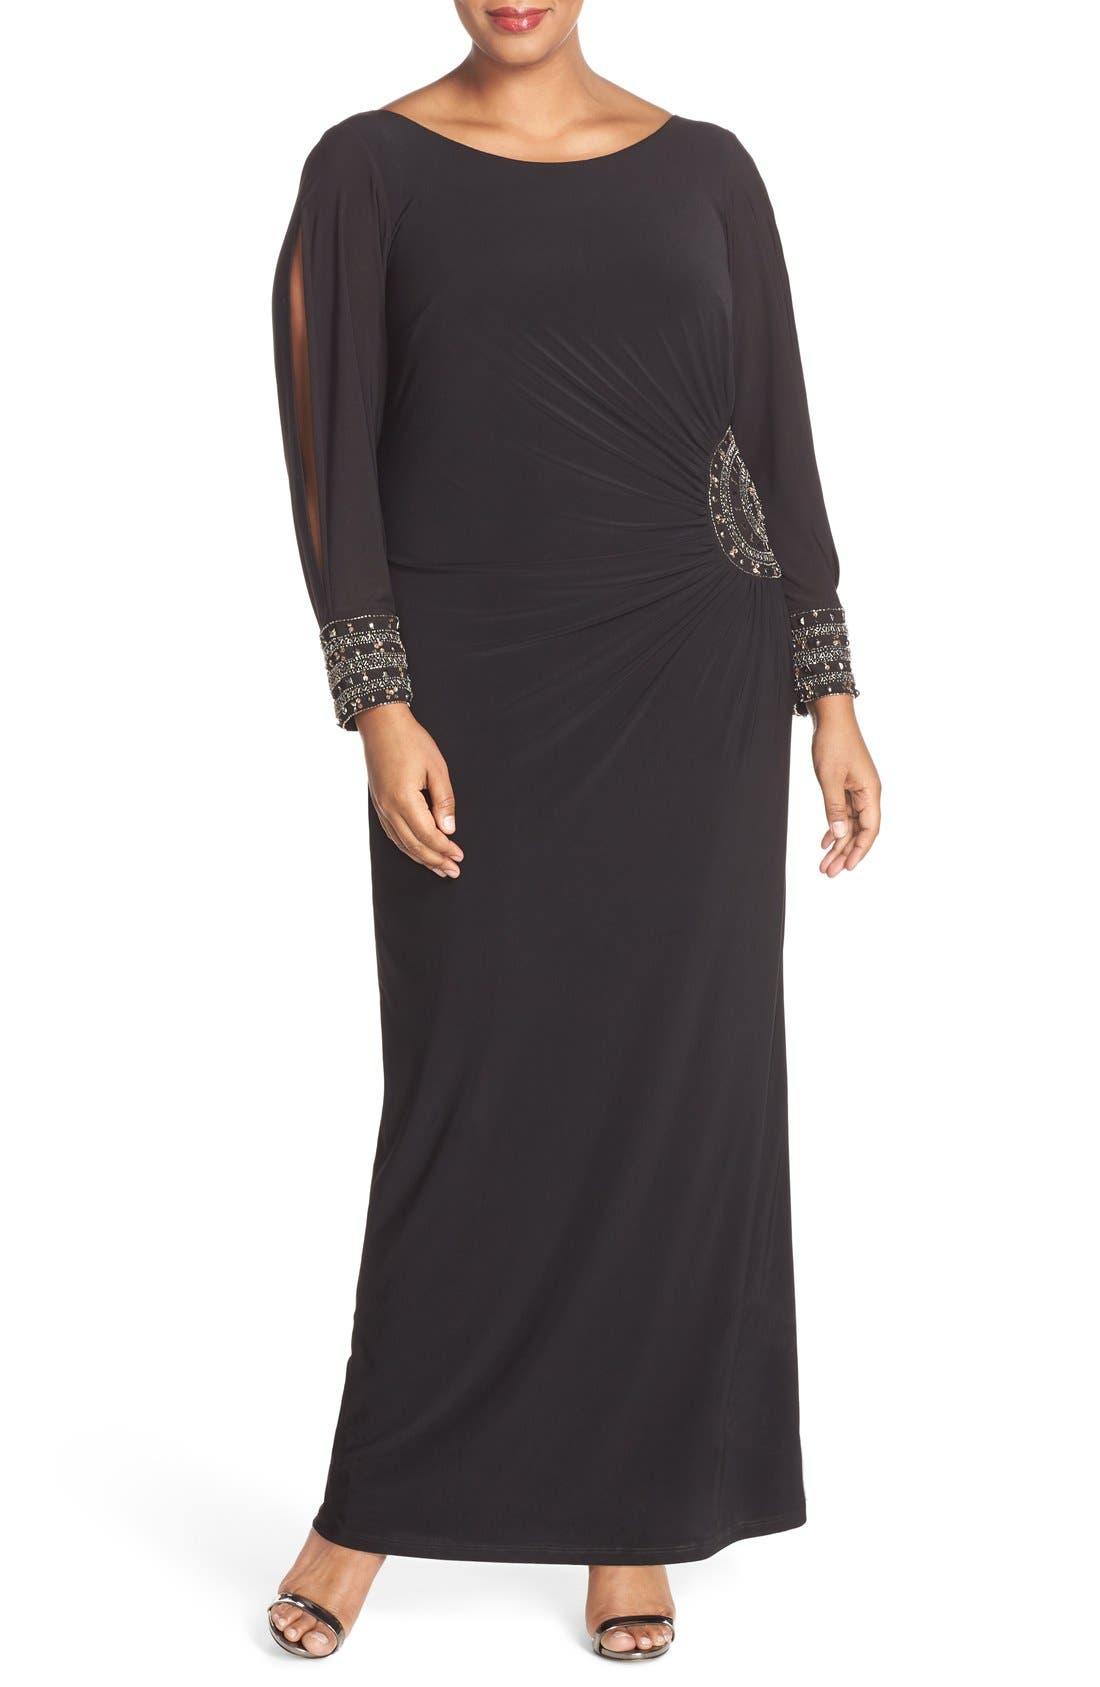 Xscape Embellished Stretch Jersey Long Dress (Plus Size)